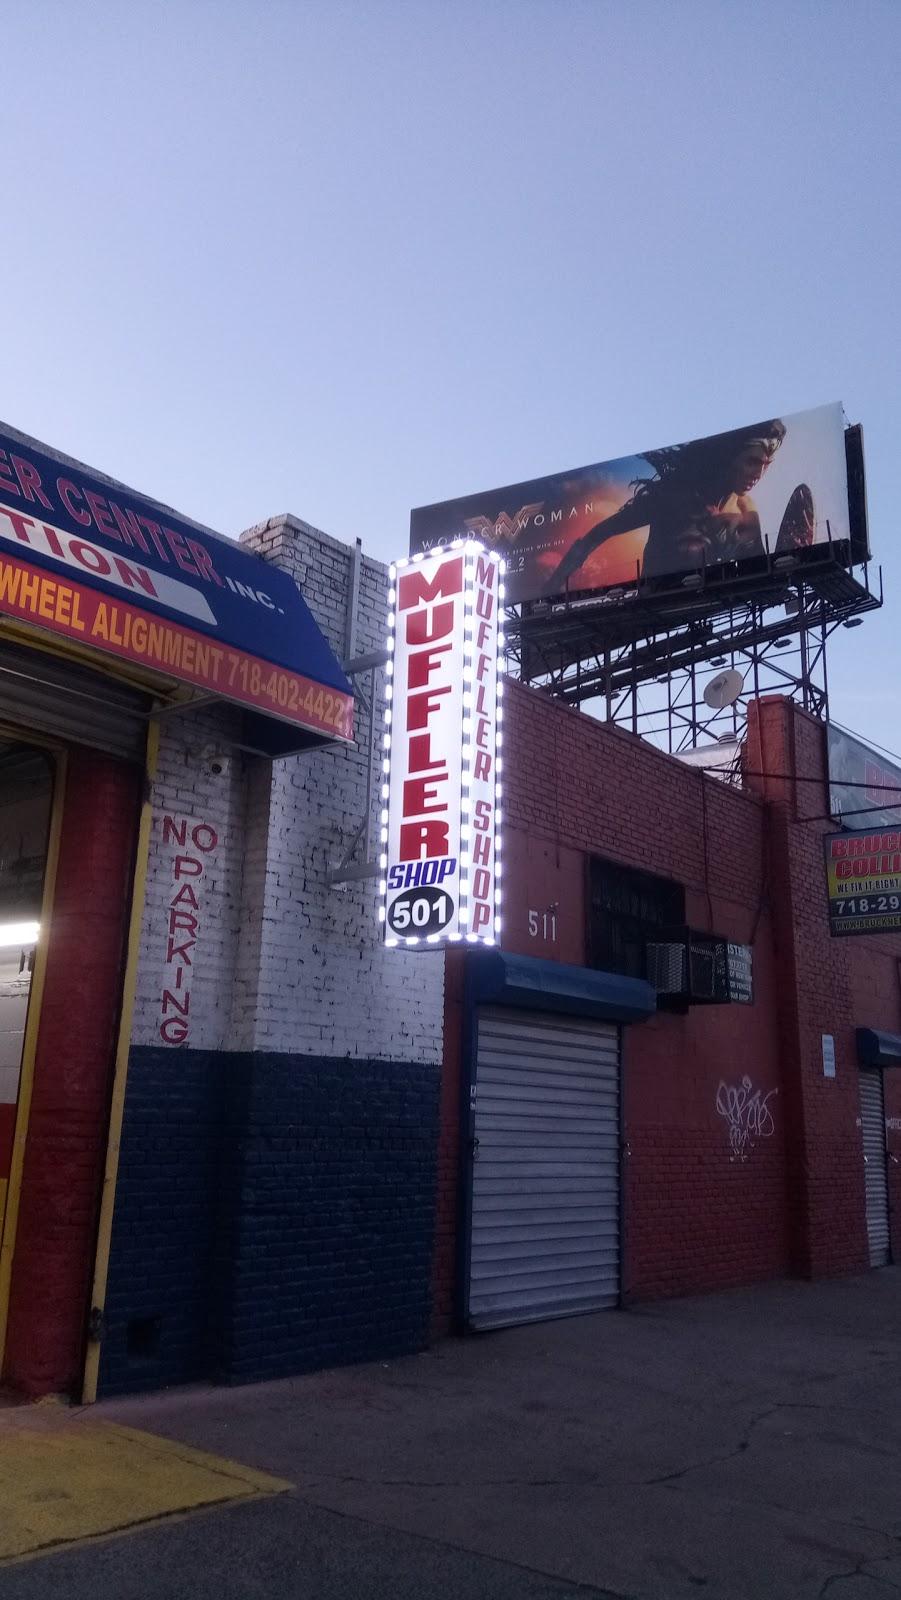 Bronx Discount Muffler Center - car repair    Photo 7 of 10   Address: 501 Bruckner Blvd, Bronx, NY 10455, USA   Phone: (718) 402-4422